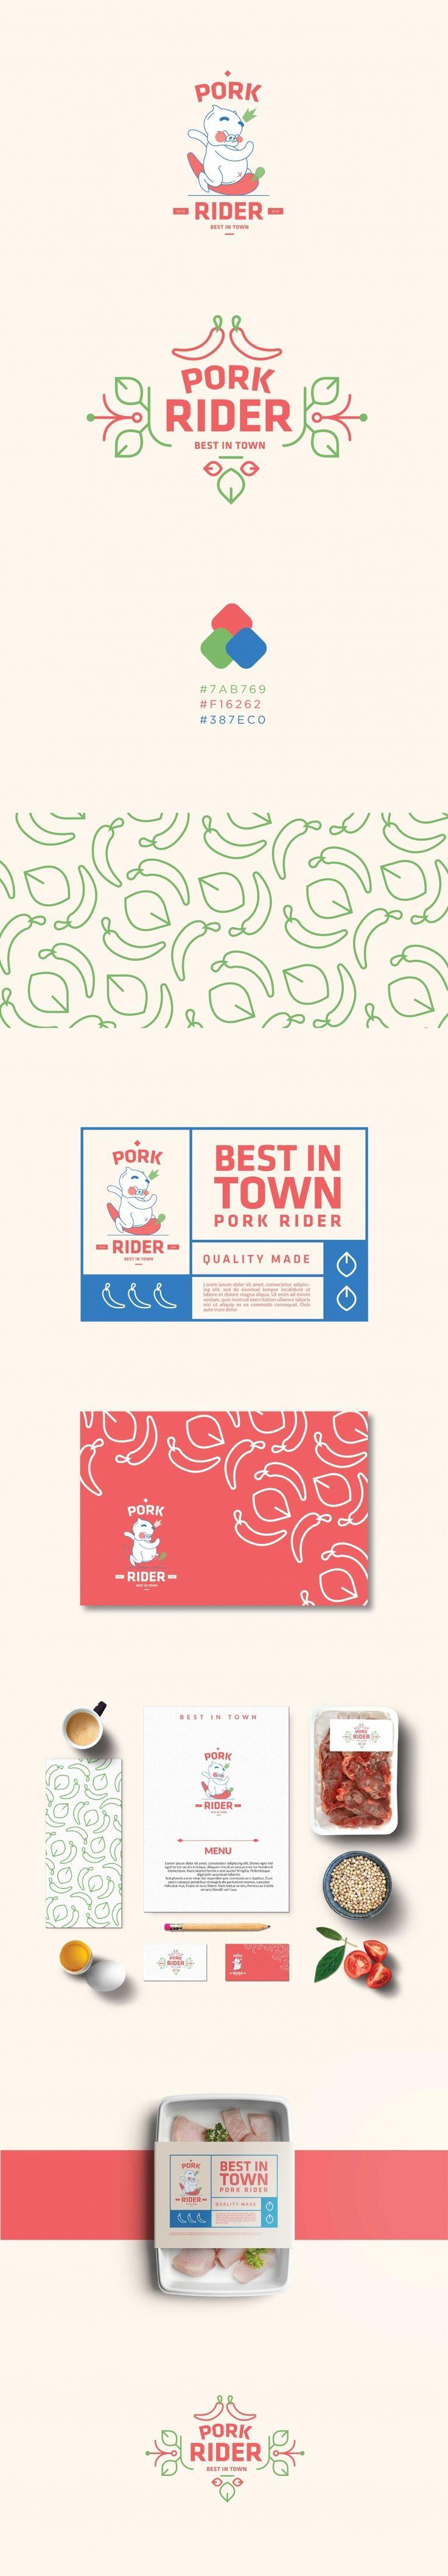 Pork Rider. Branding | Kreavi.com